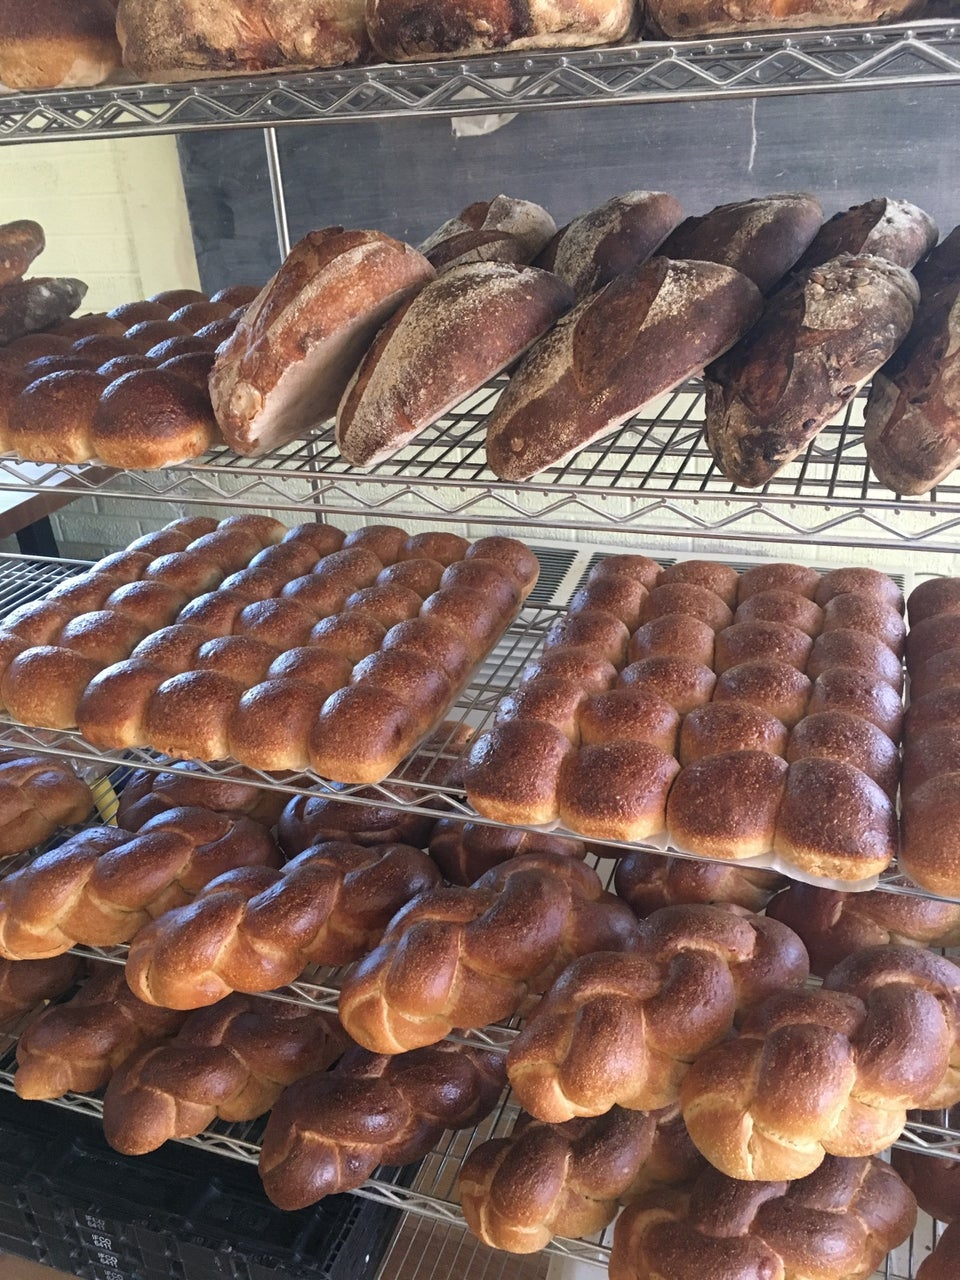 Raleigh Street Bakery Bread 5245 Raleigh St, Denver